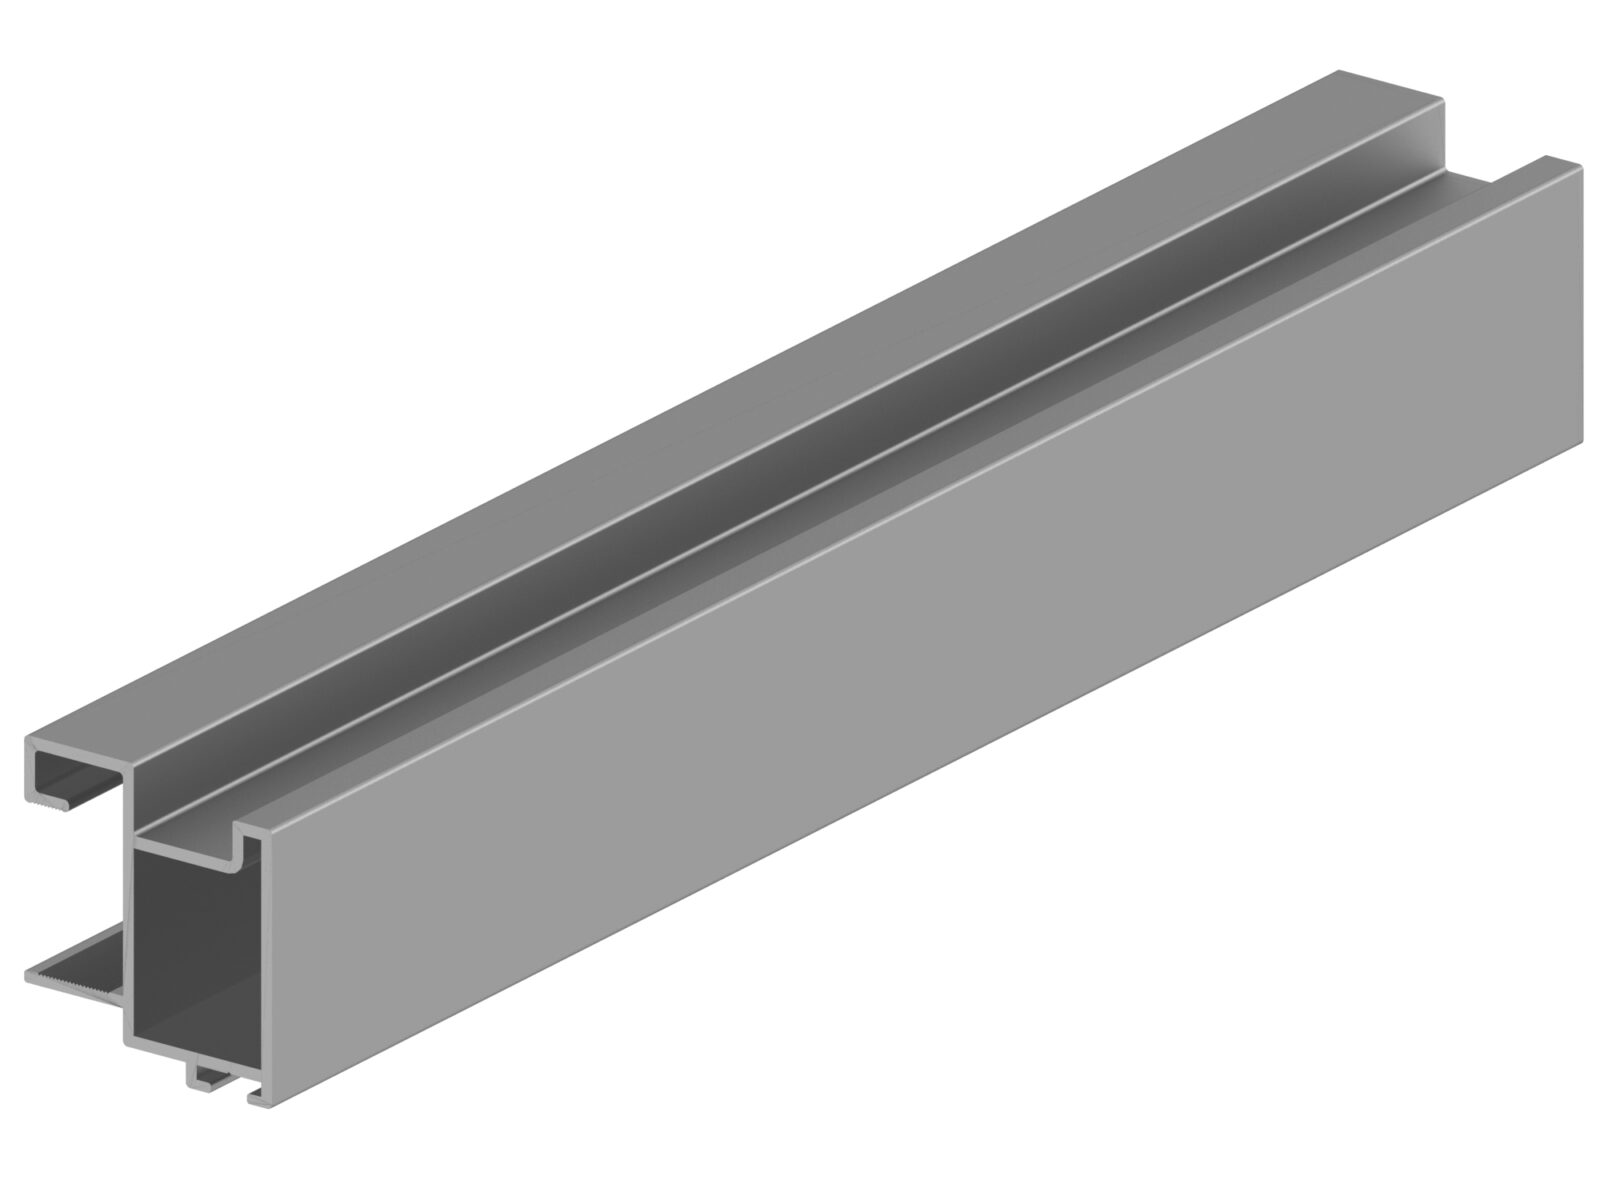 Kit puerta corredera armario acu a plata g80 cat logo for Kit armario empotrado